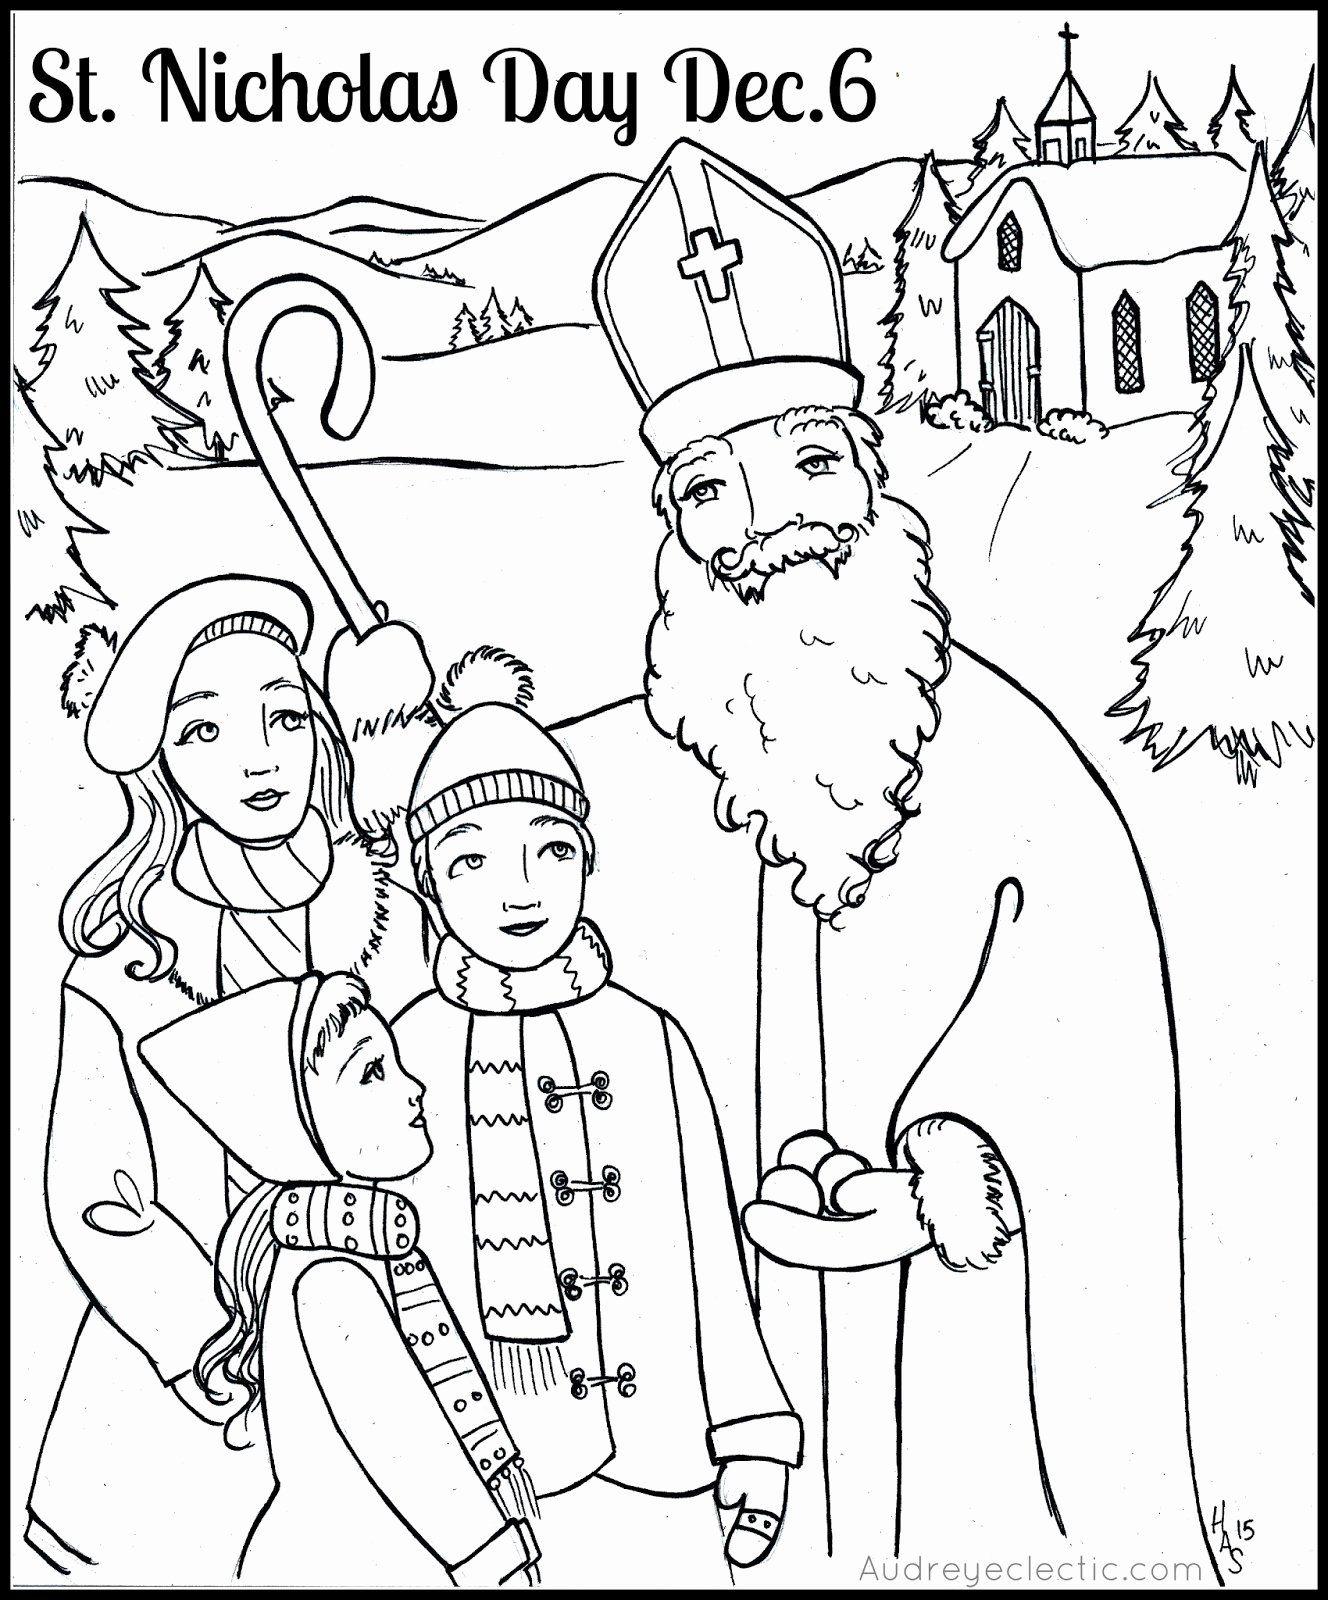 Saint Nicholas Coloring Page Inspirational Free Printable St Nicholas Day Sleightholm Folk Art